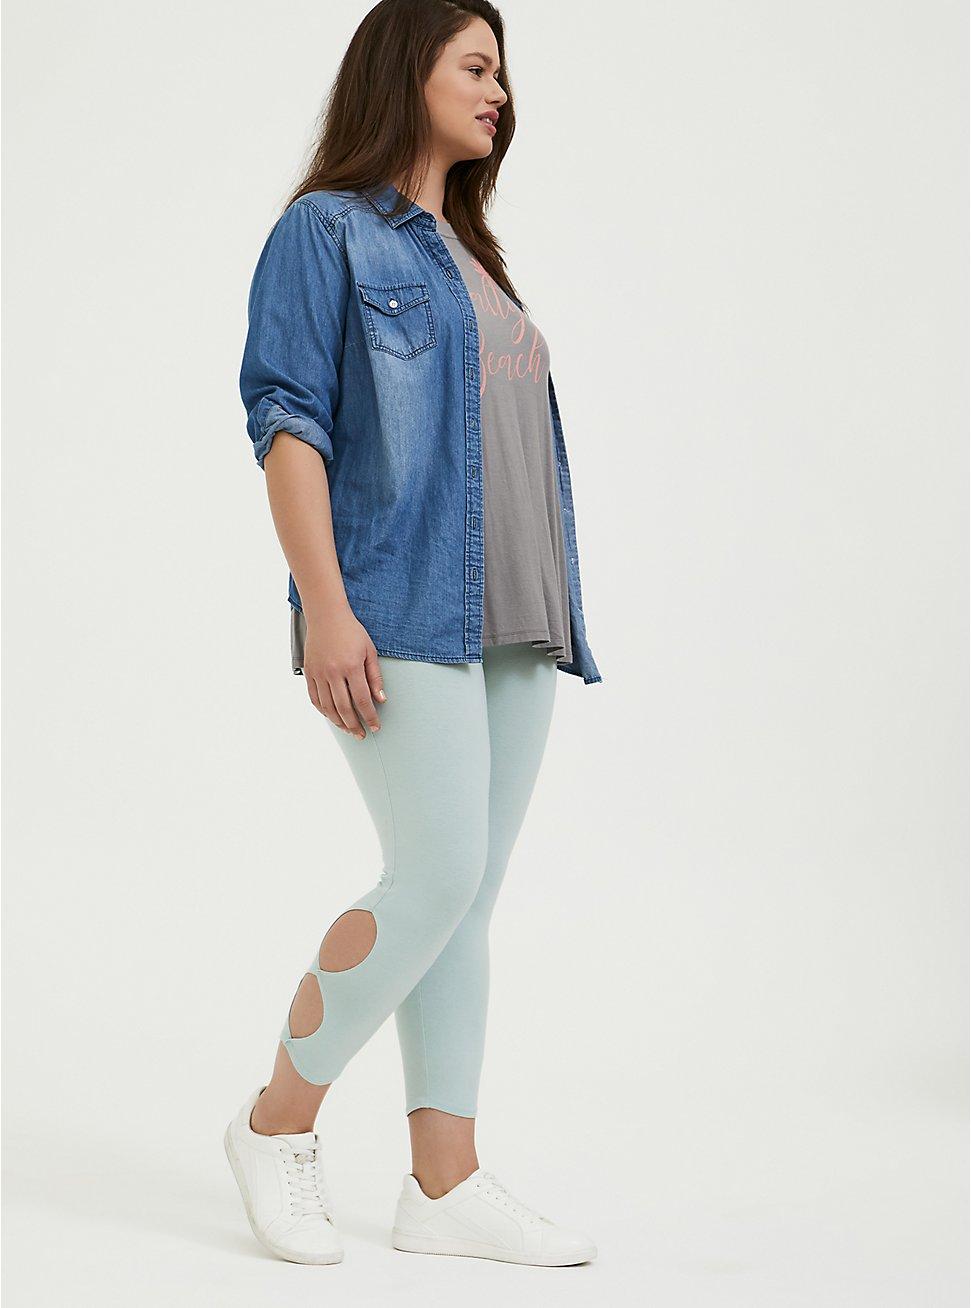 Crop Premium Legging - Dual Keyhole Mint Blue, , hi-res